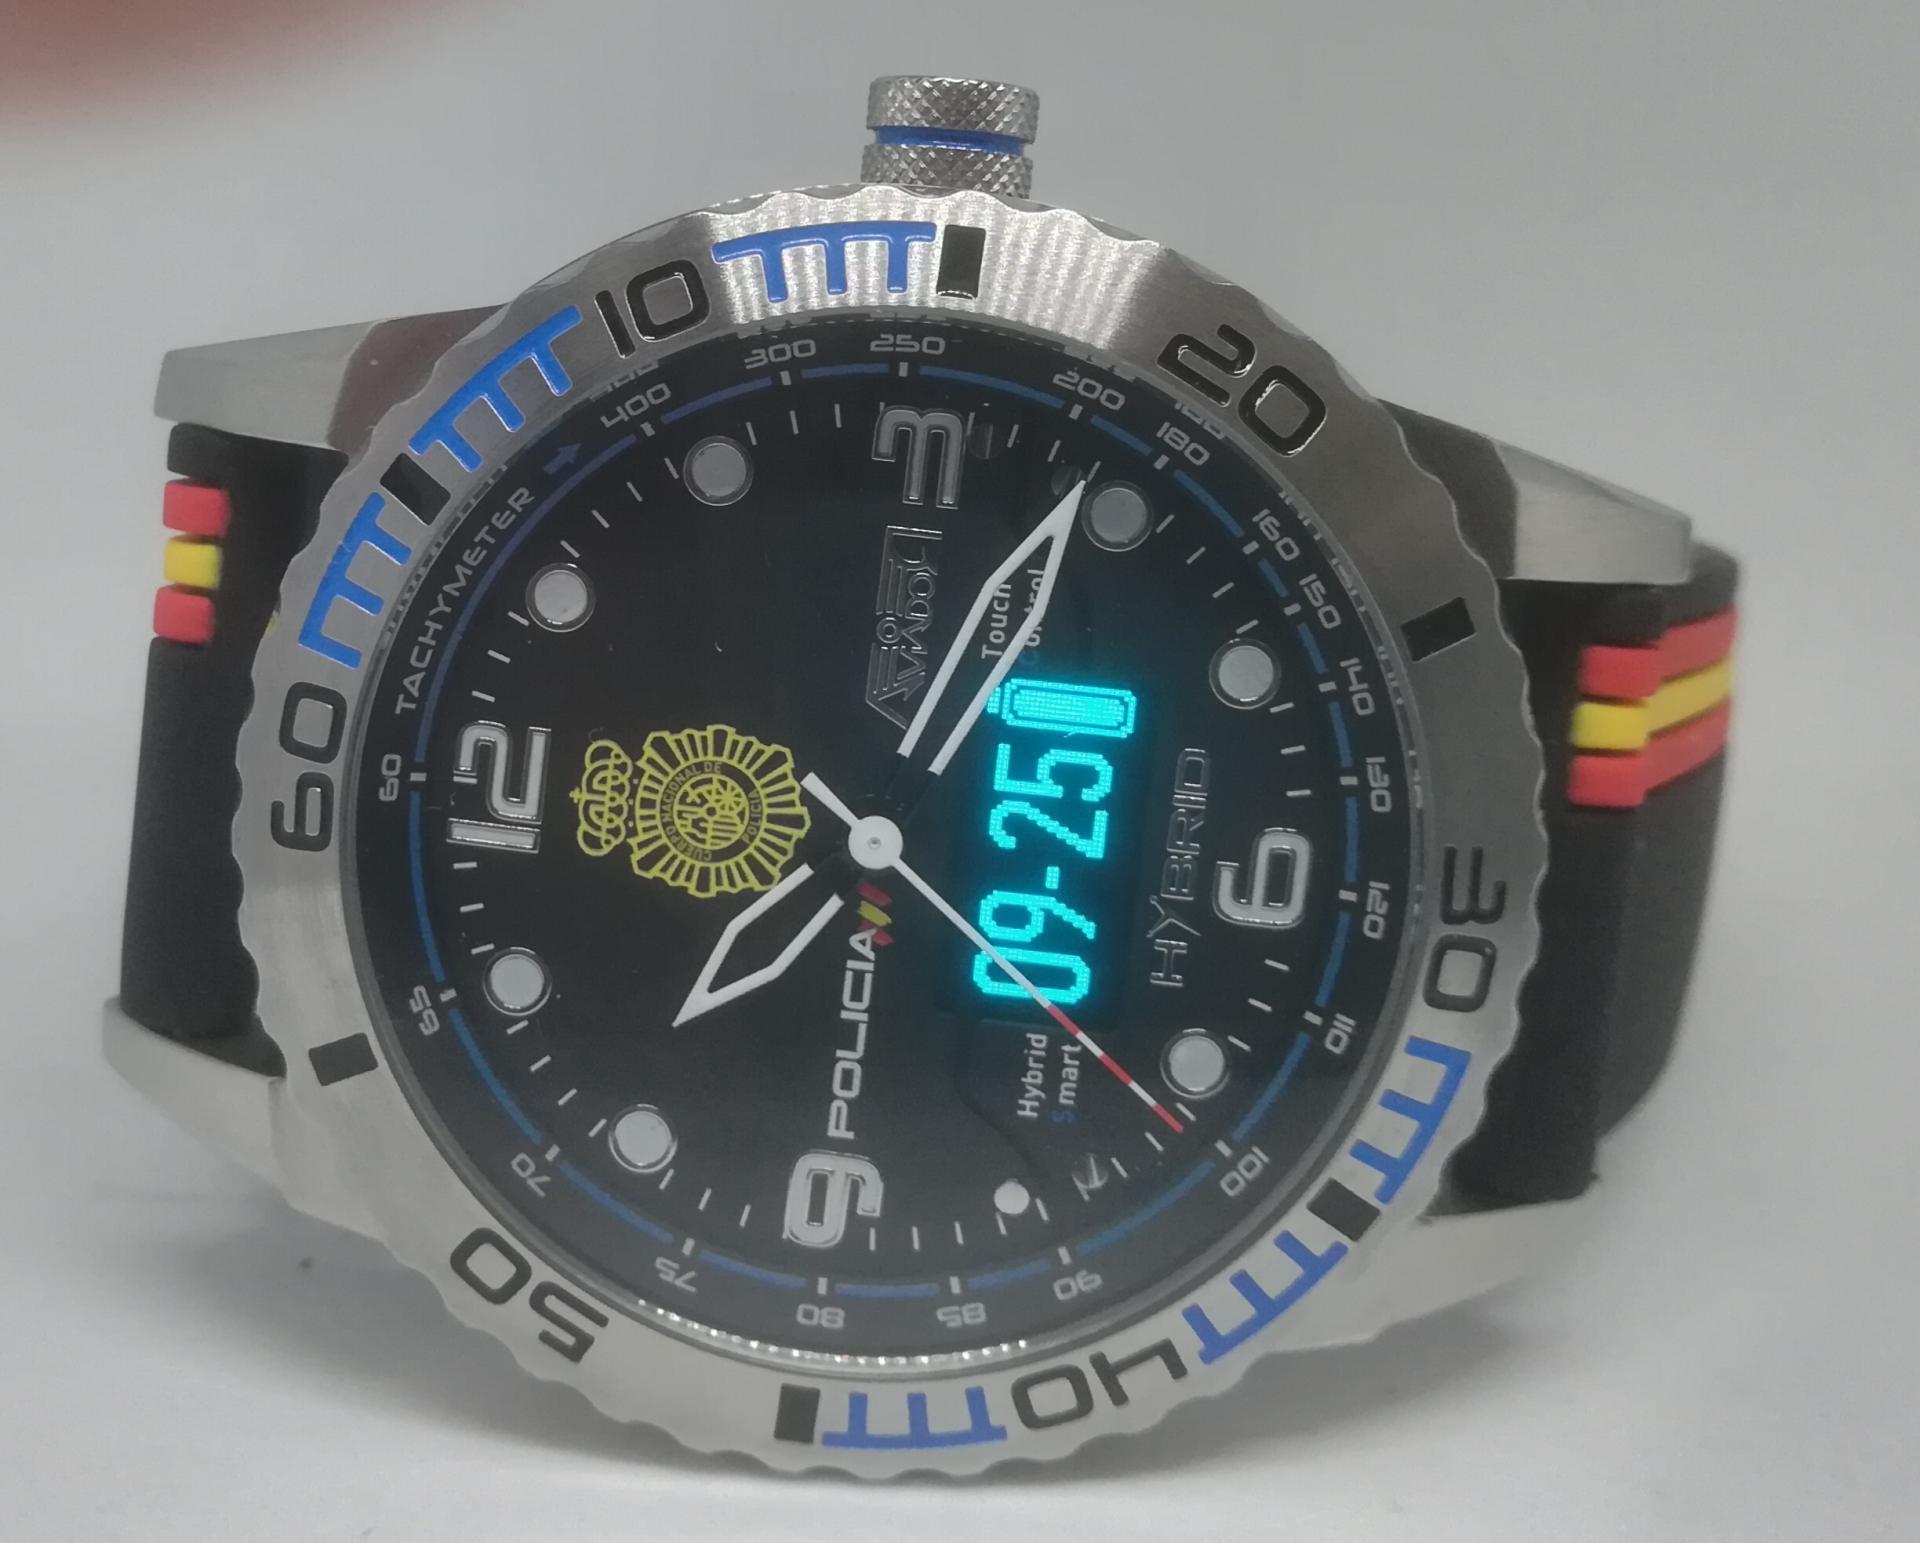 Reloj Cuerpo Nacional De Policia Aviador Smart Time